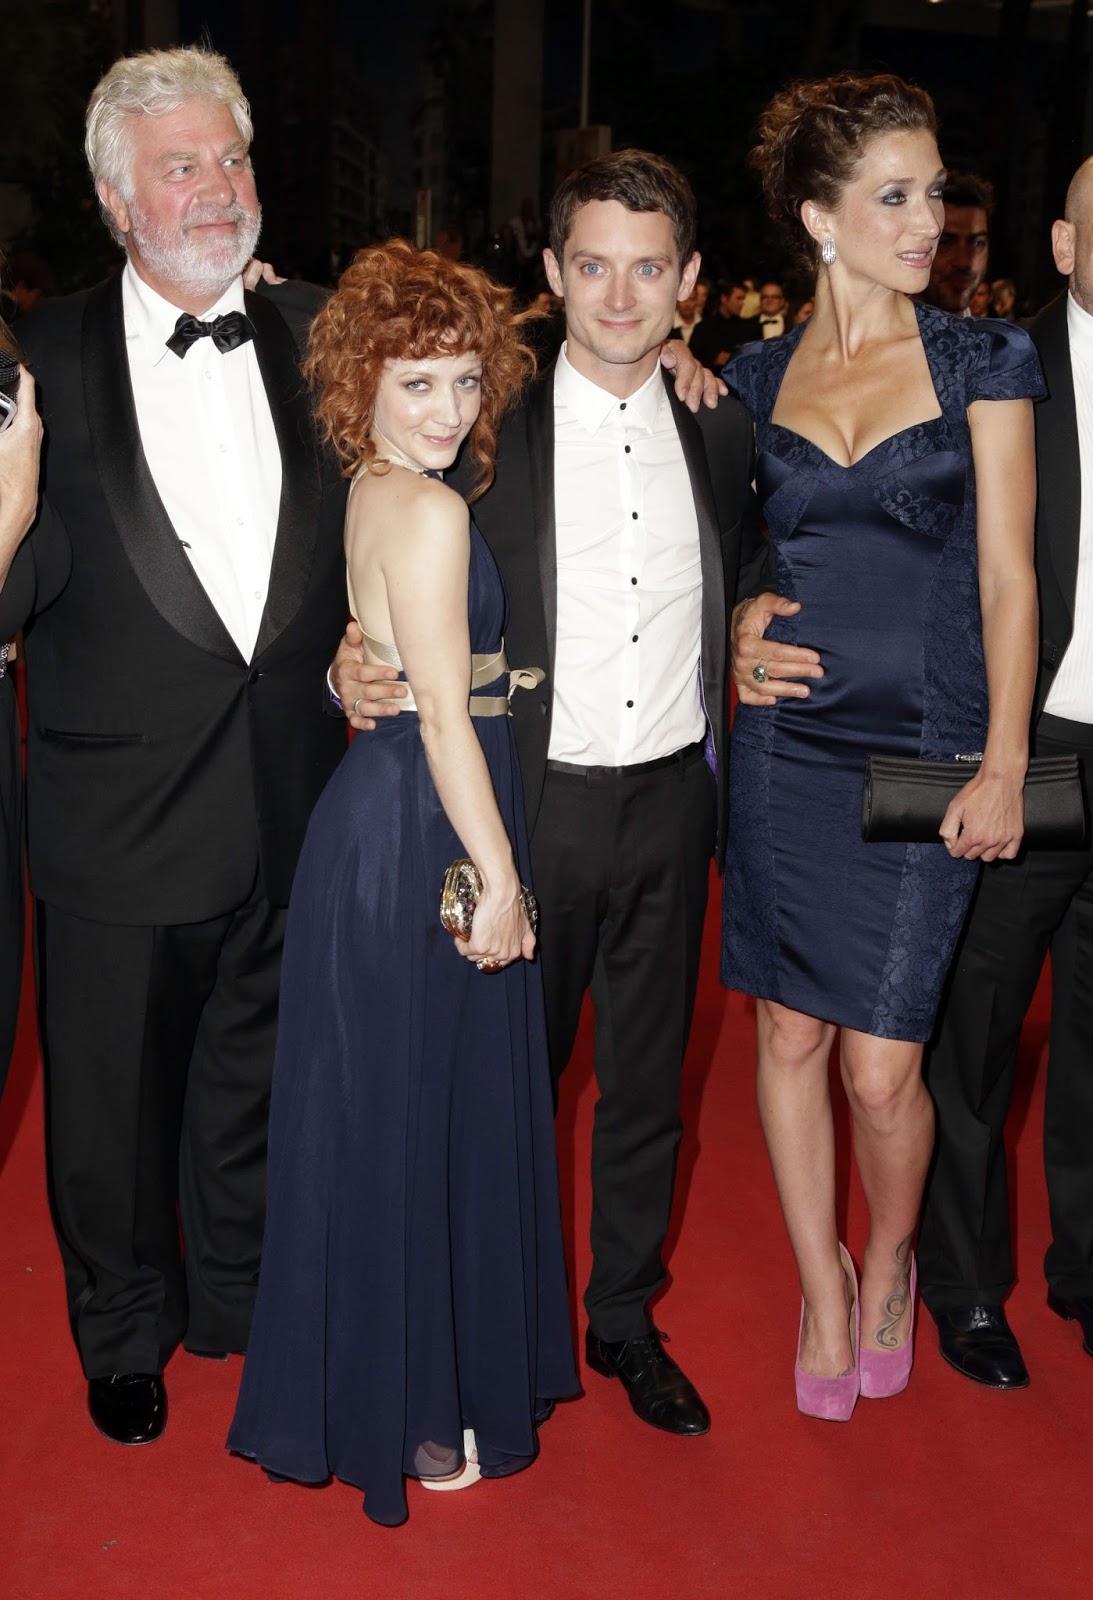 Short Celebrities: Elijah Wood 1.65 cm